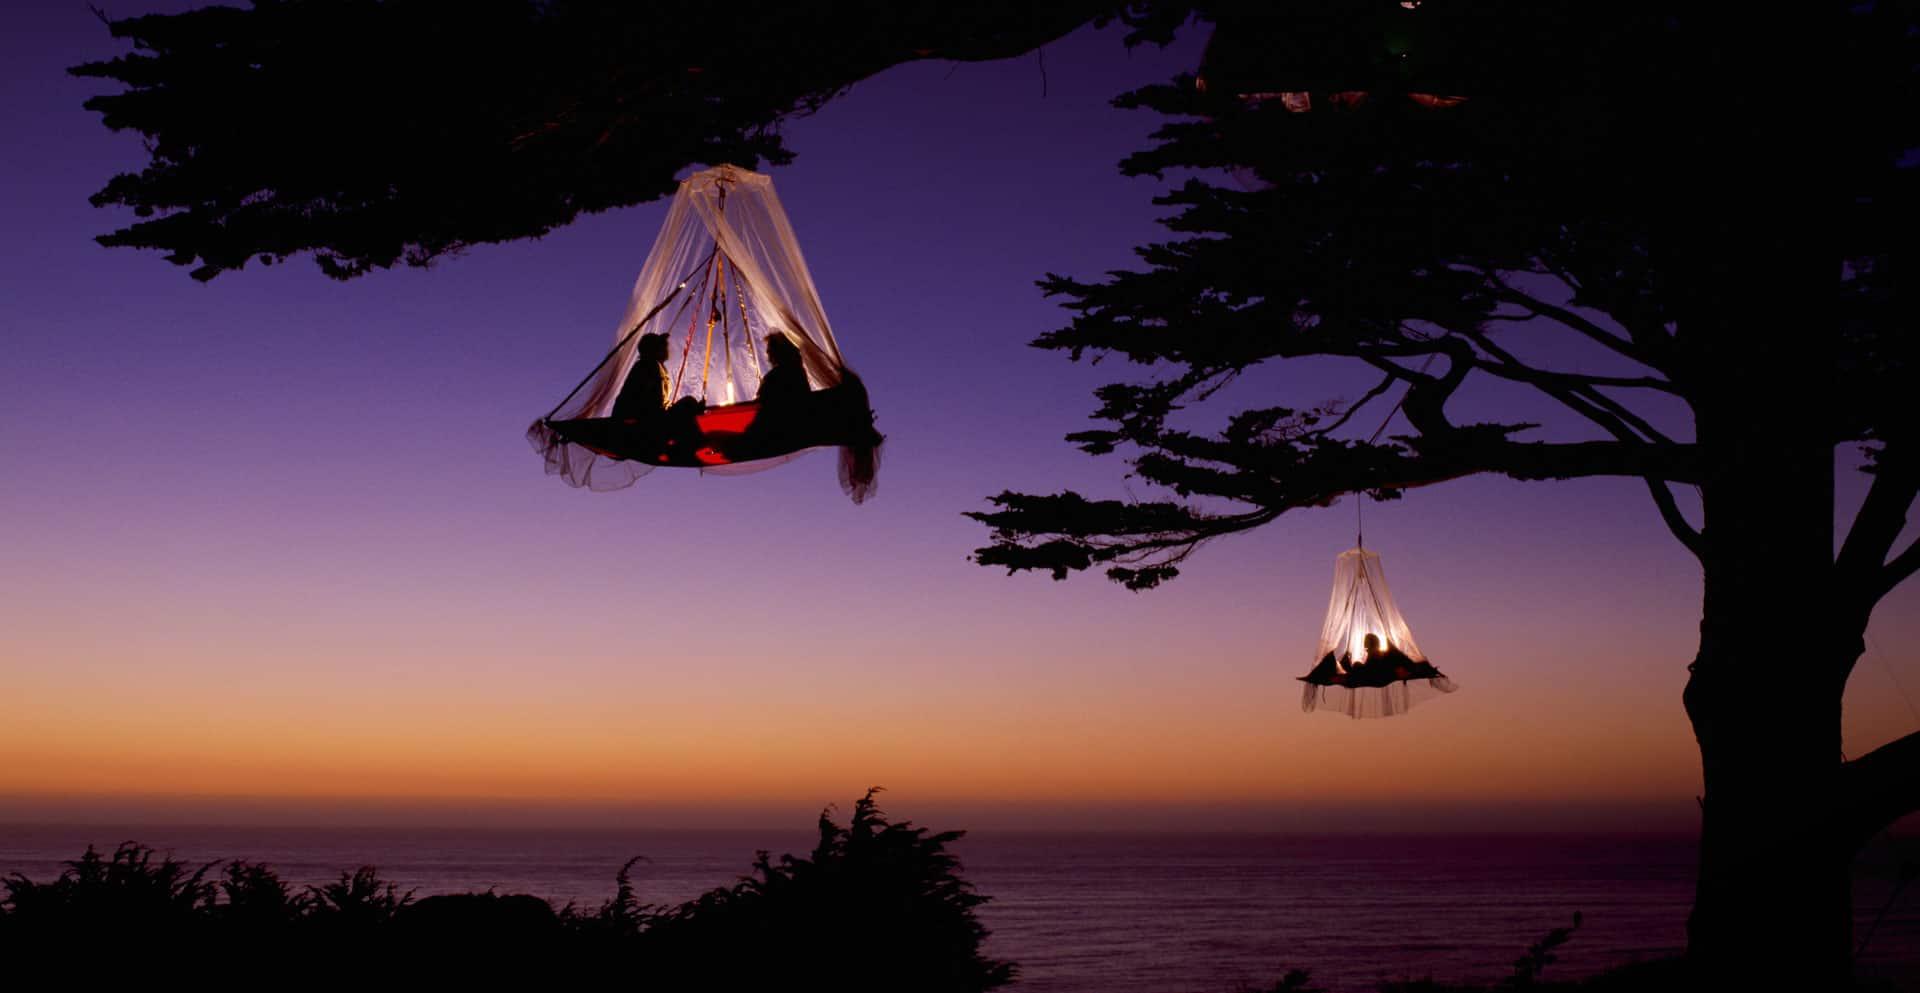 tree camping in elk california explore the usa